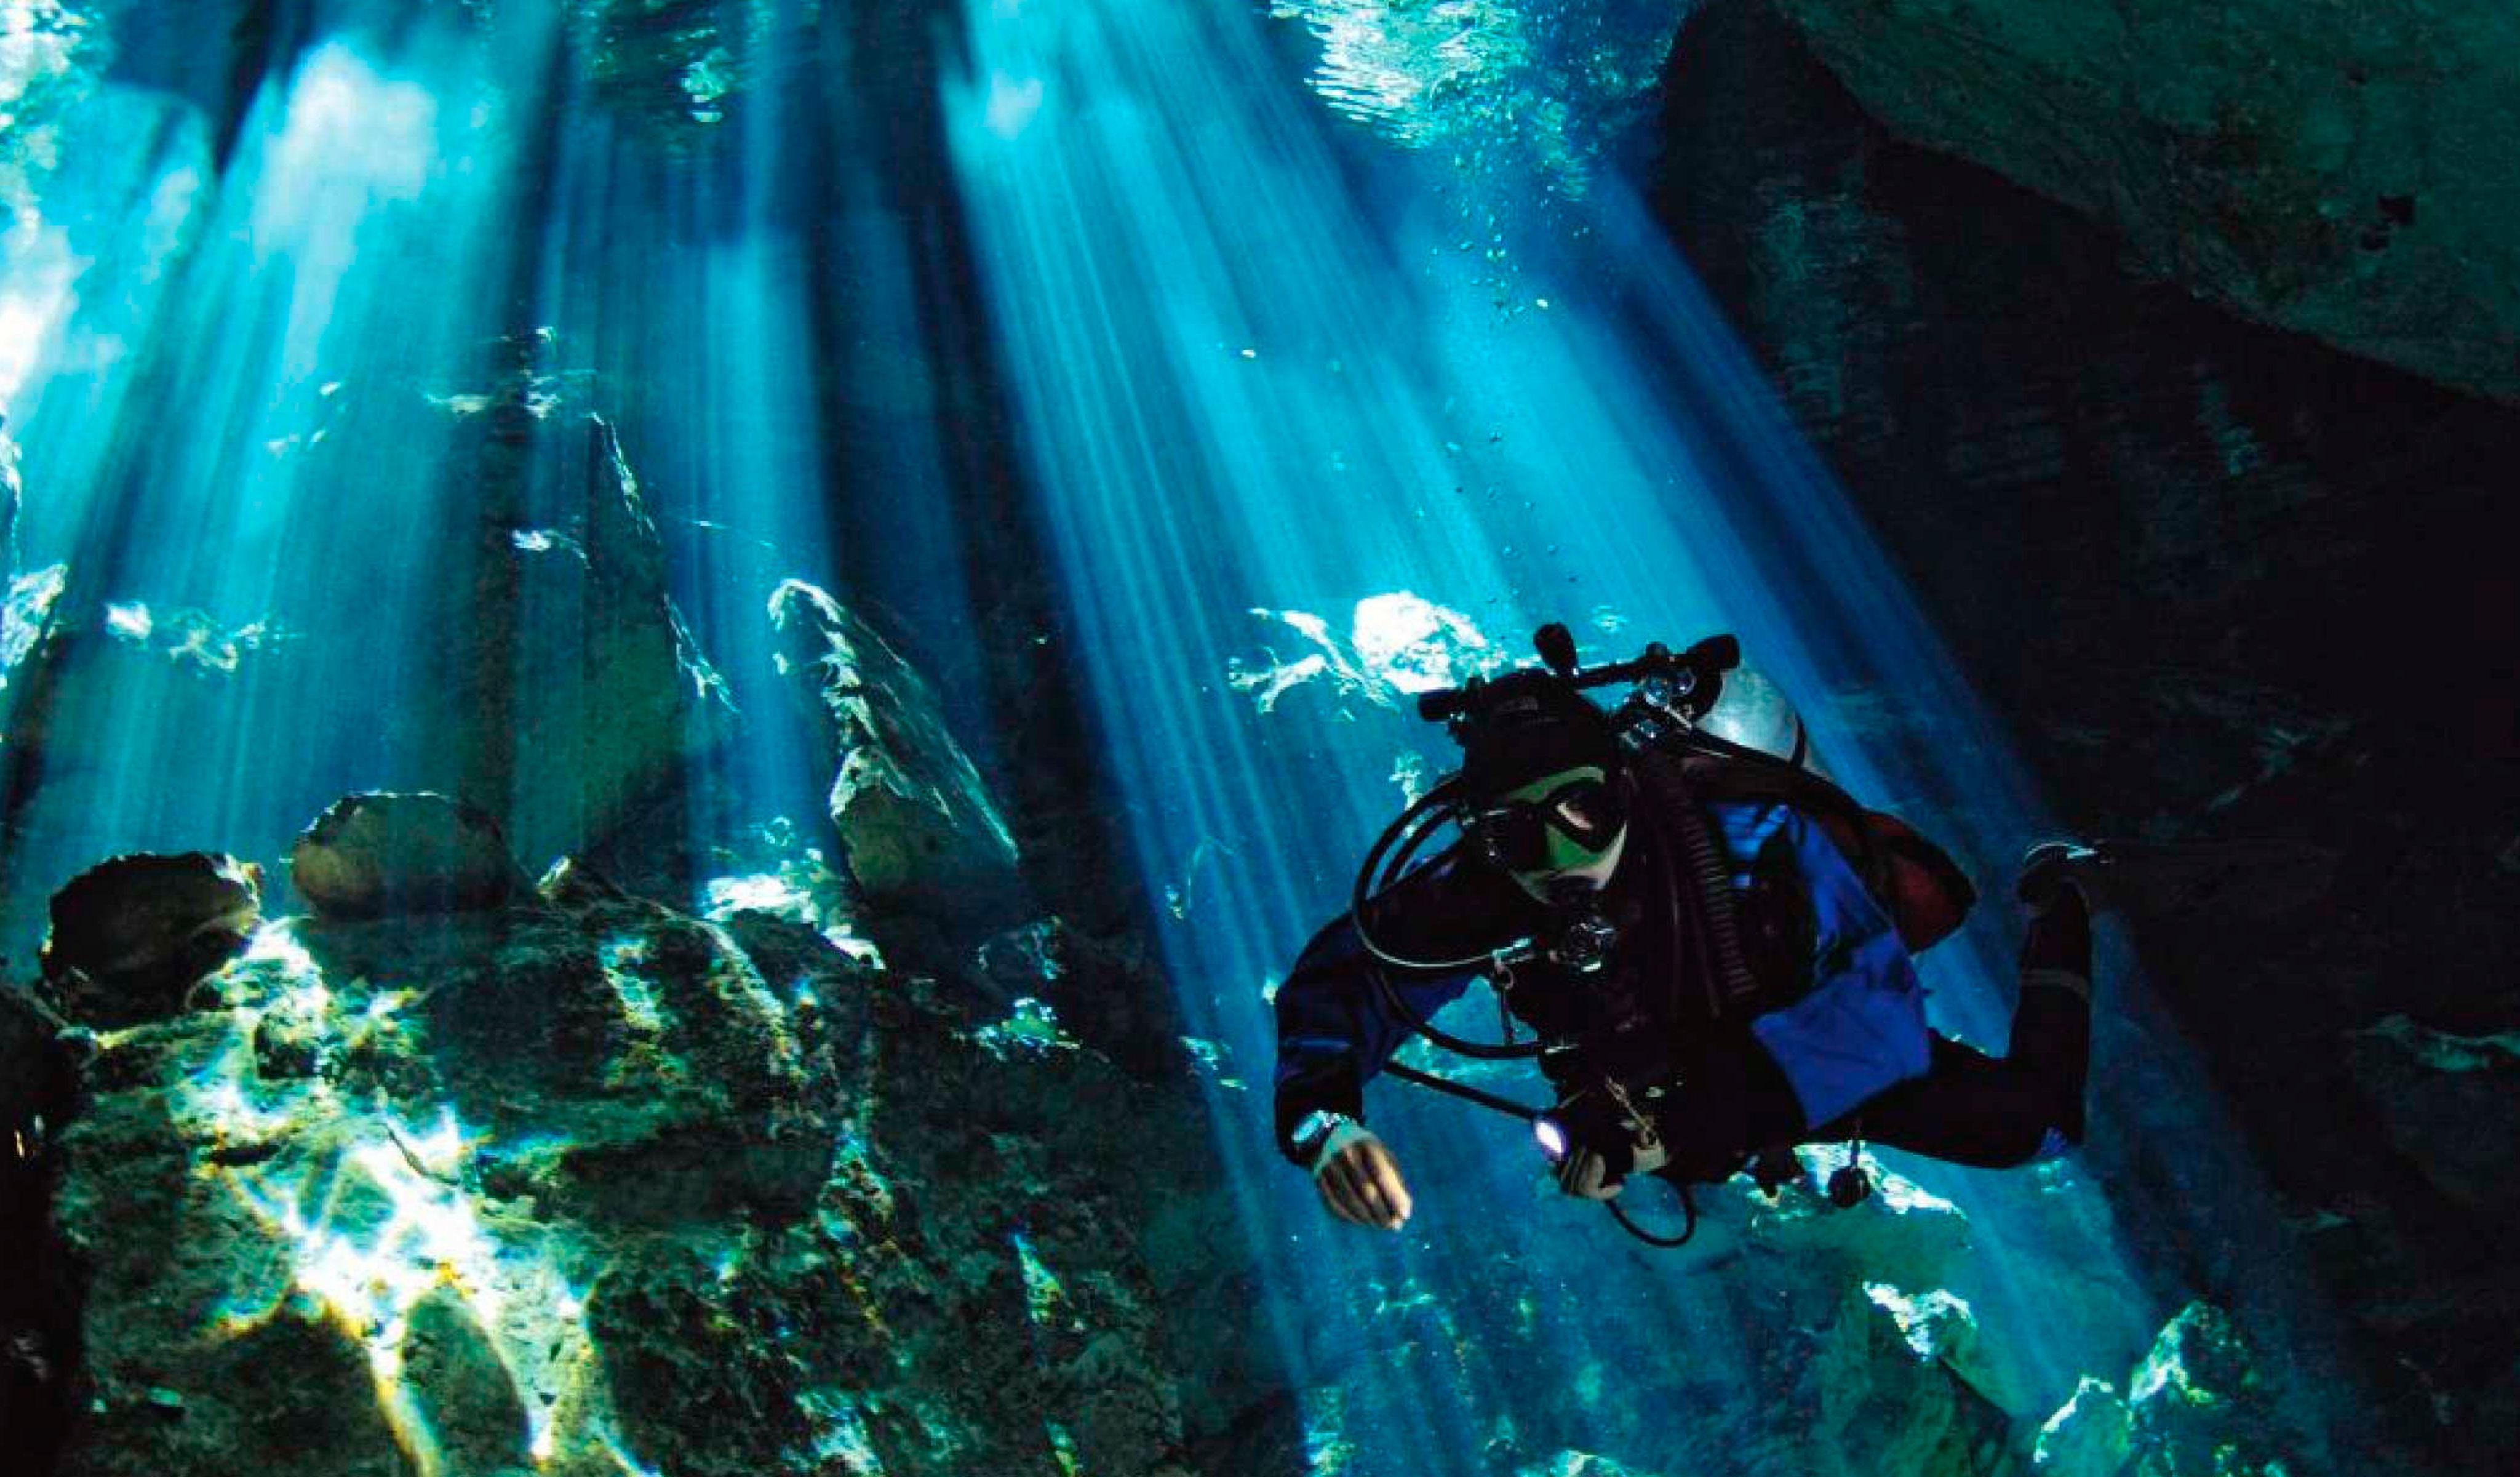 scuba diving wallpaper wallpapers - photo #22